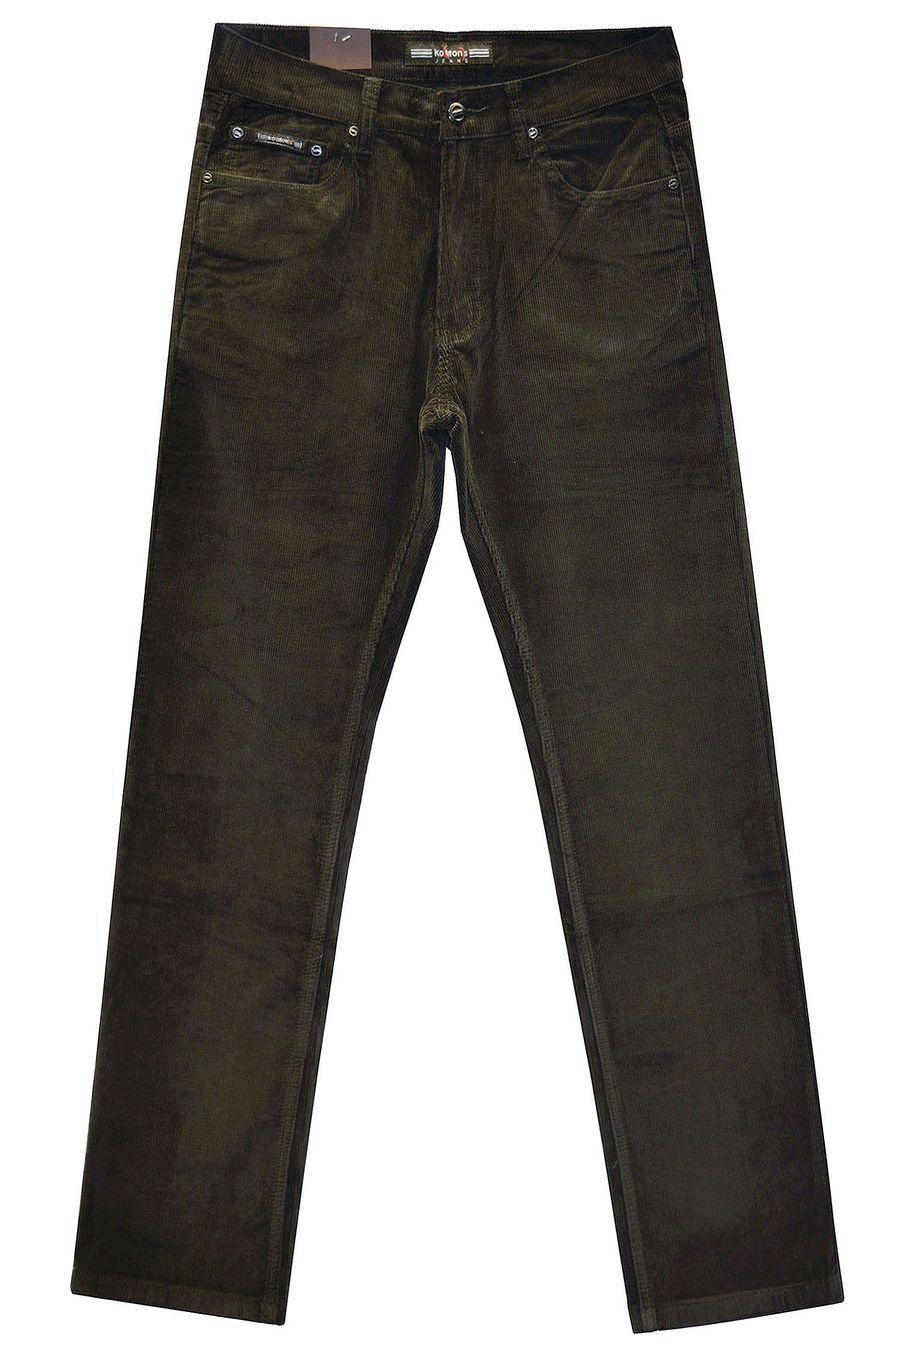 Брюки мужские Koutons KL-8104 Brown вельветовые - фото 1